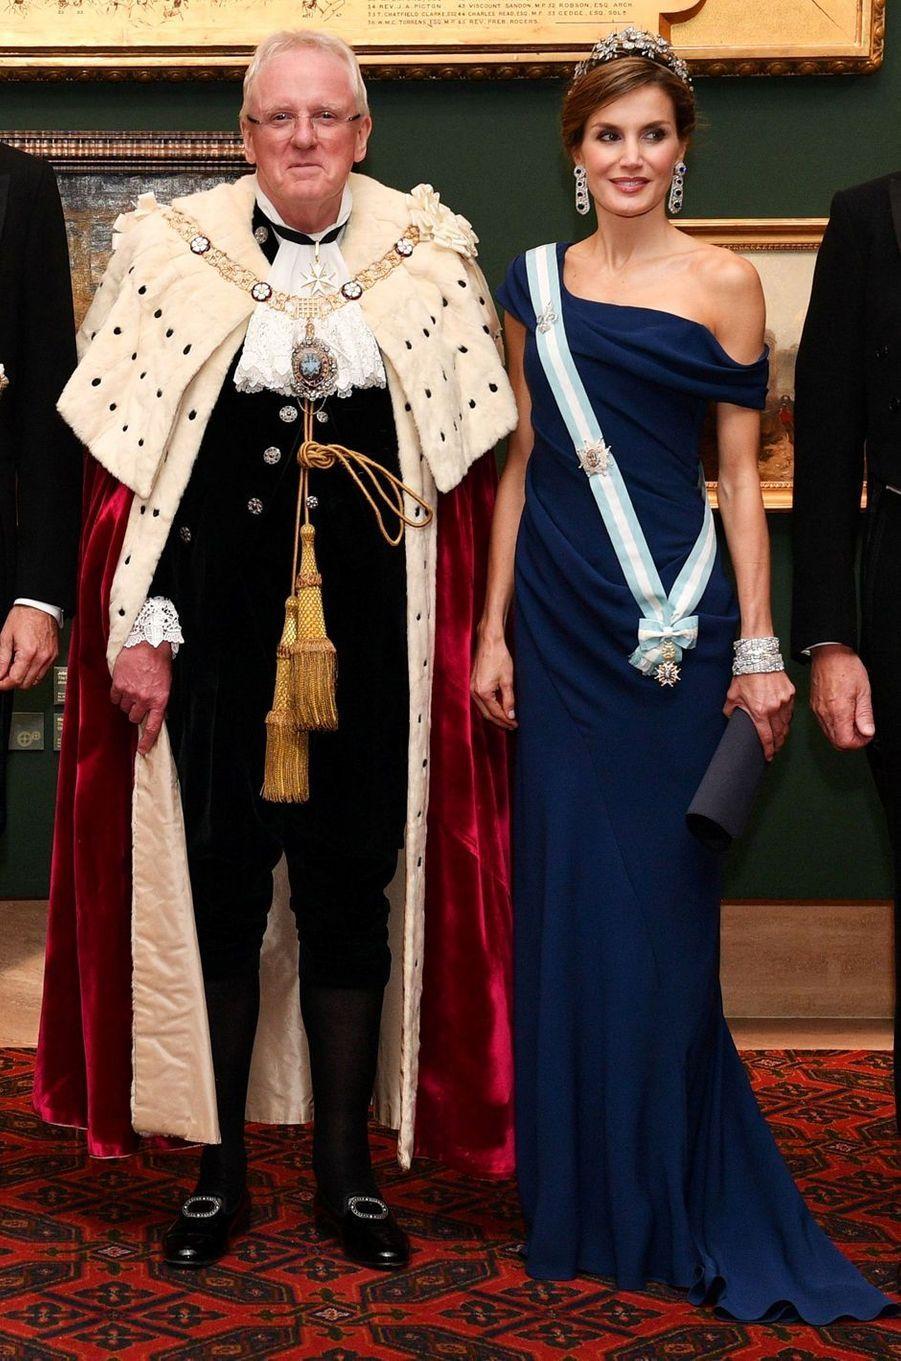 La reine Letizia d'Espagne en Carolina Herrera, le 13 juillet 2017